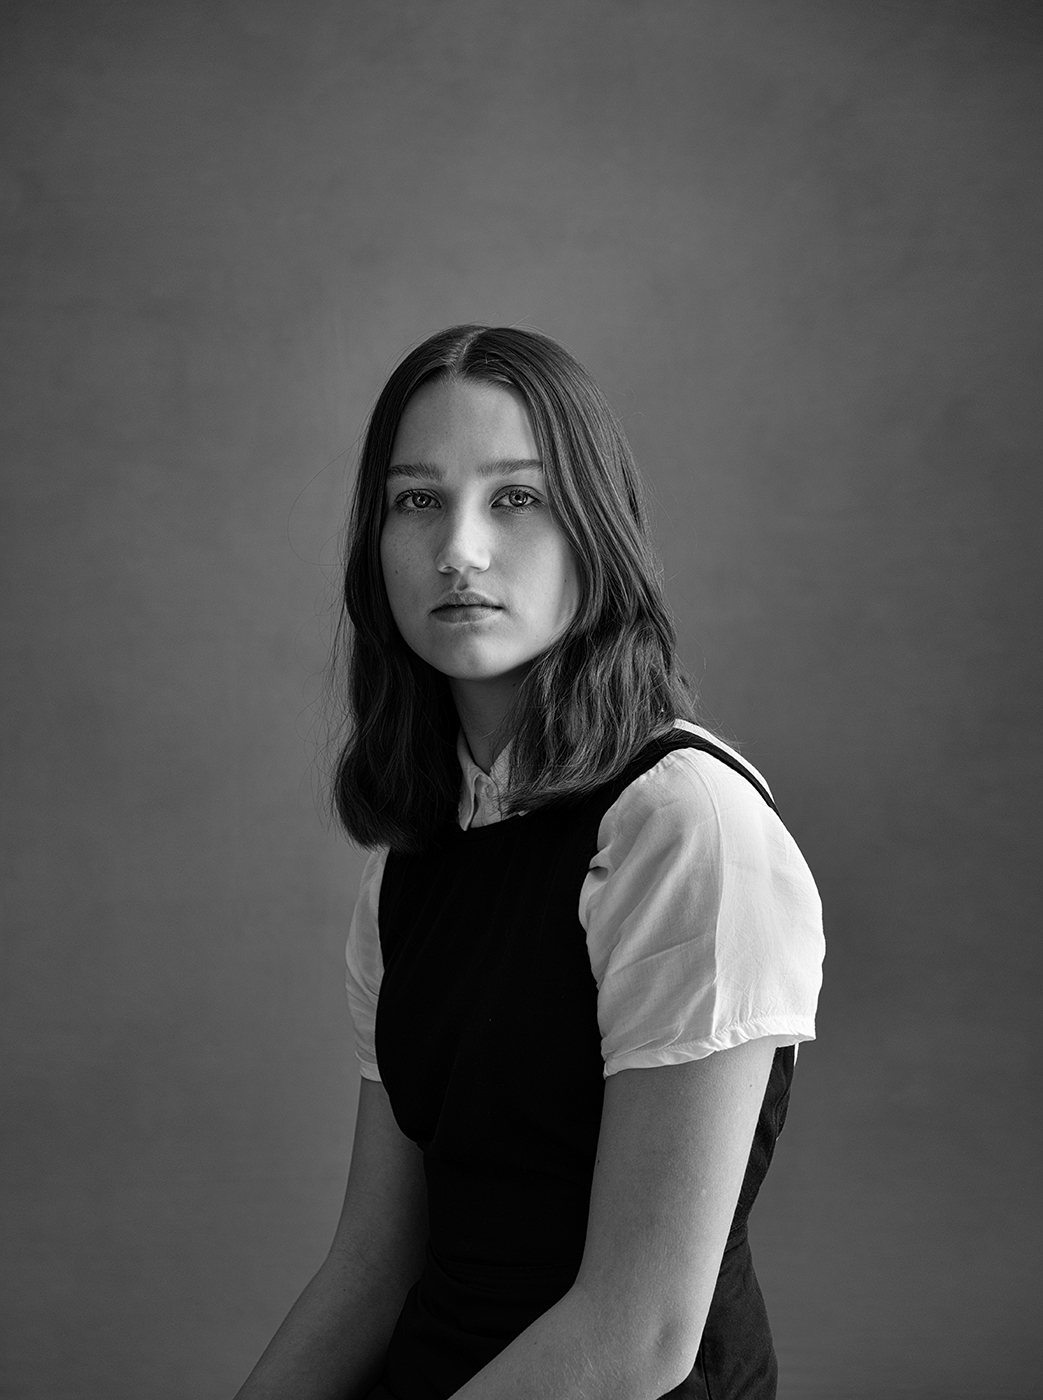 portret, portrait, black&white, portrait of Merle, Susanne Middelberg